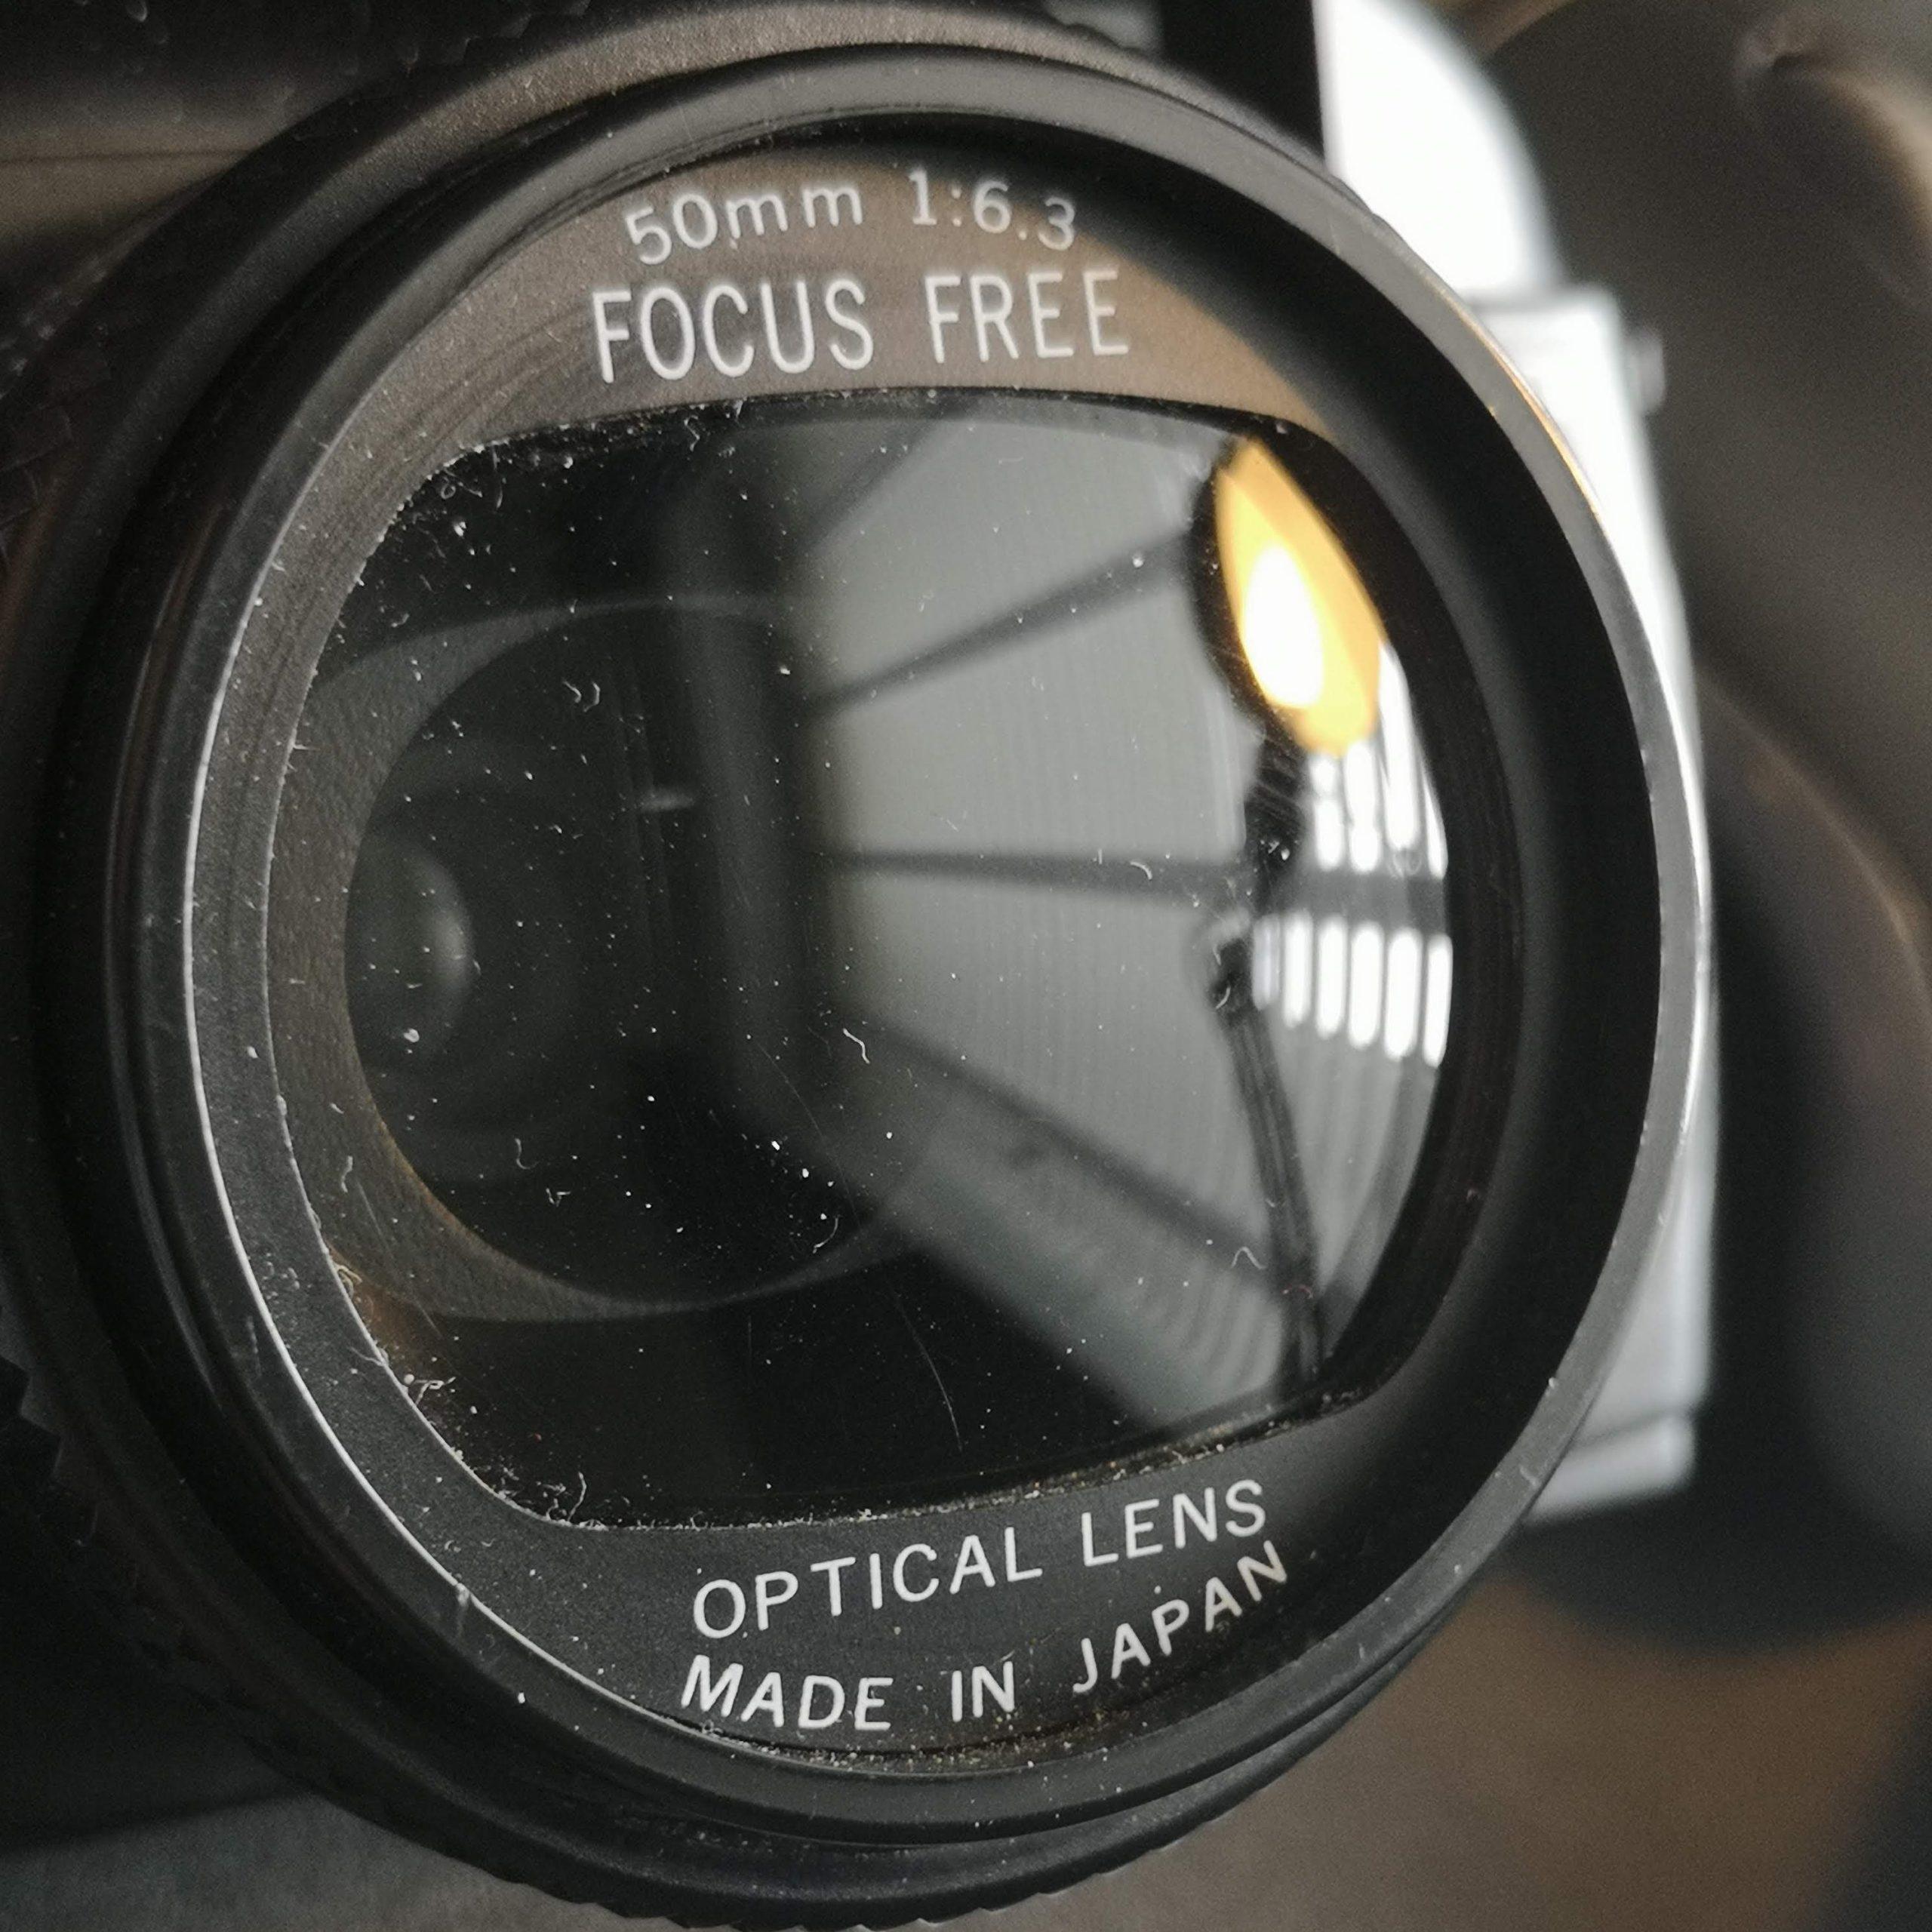 lens of Tamashi FMD QP8000